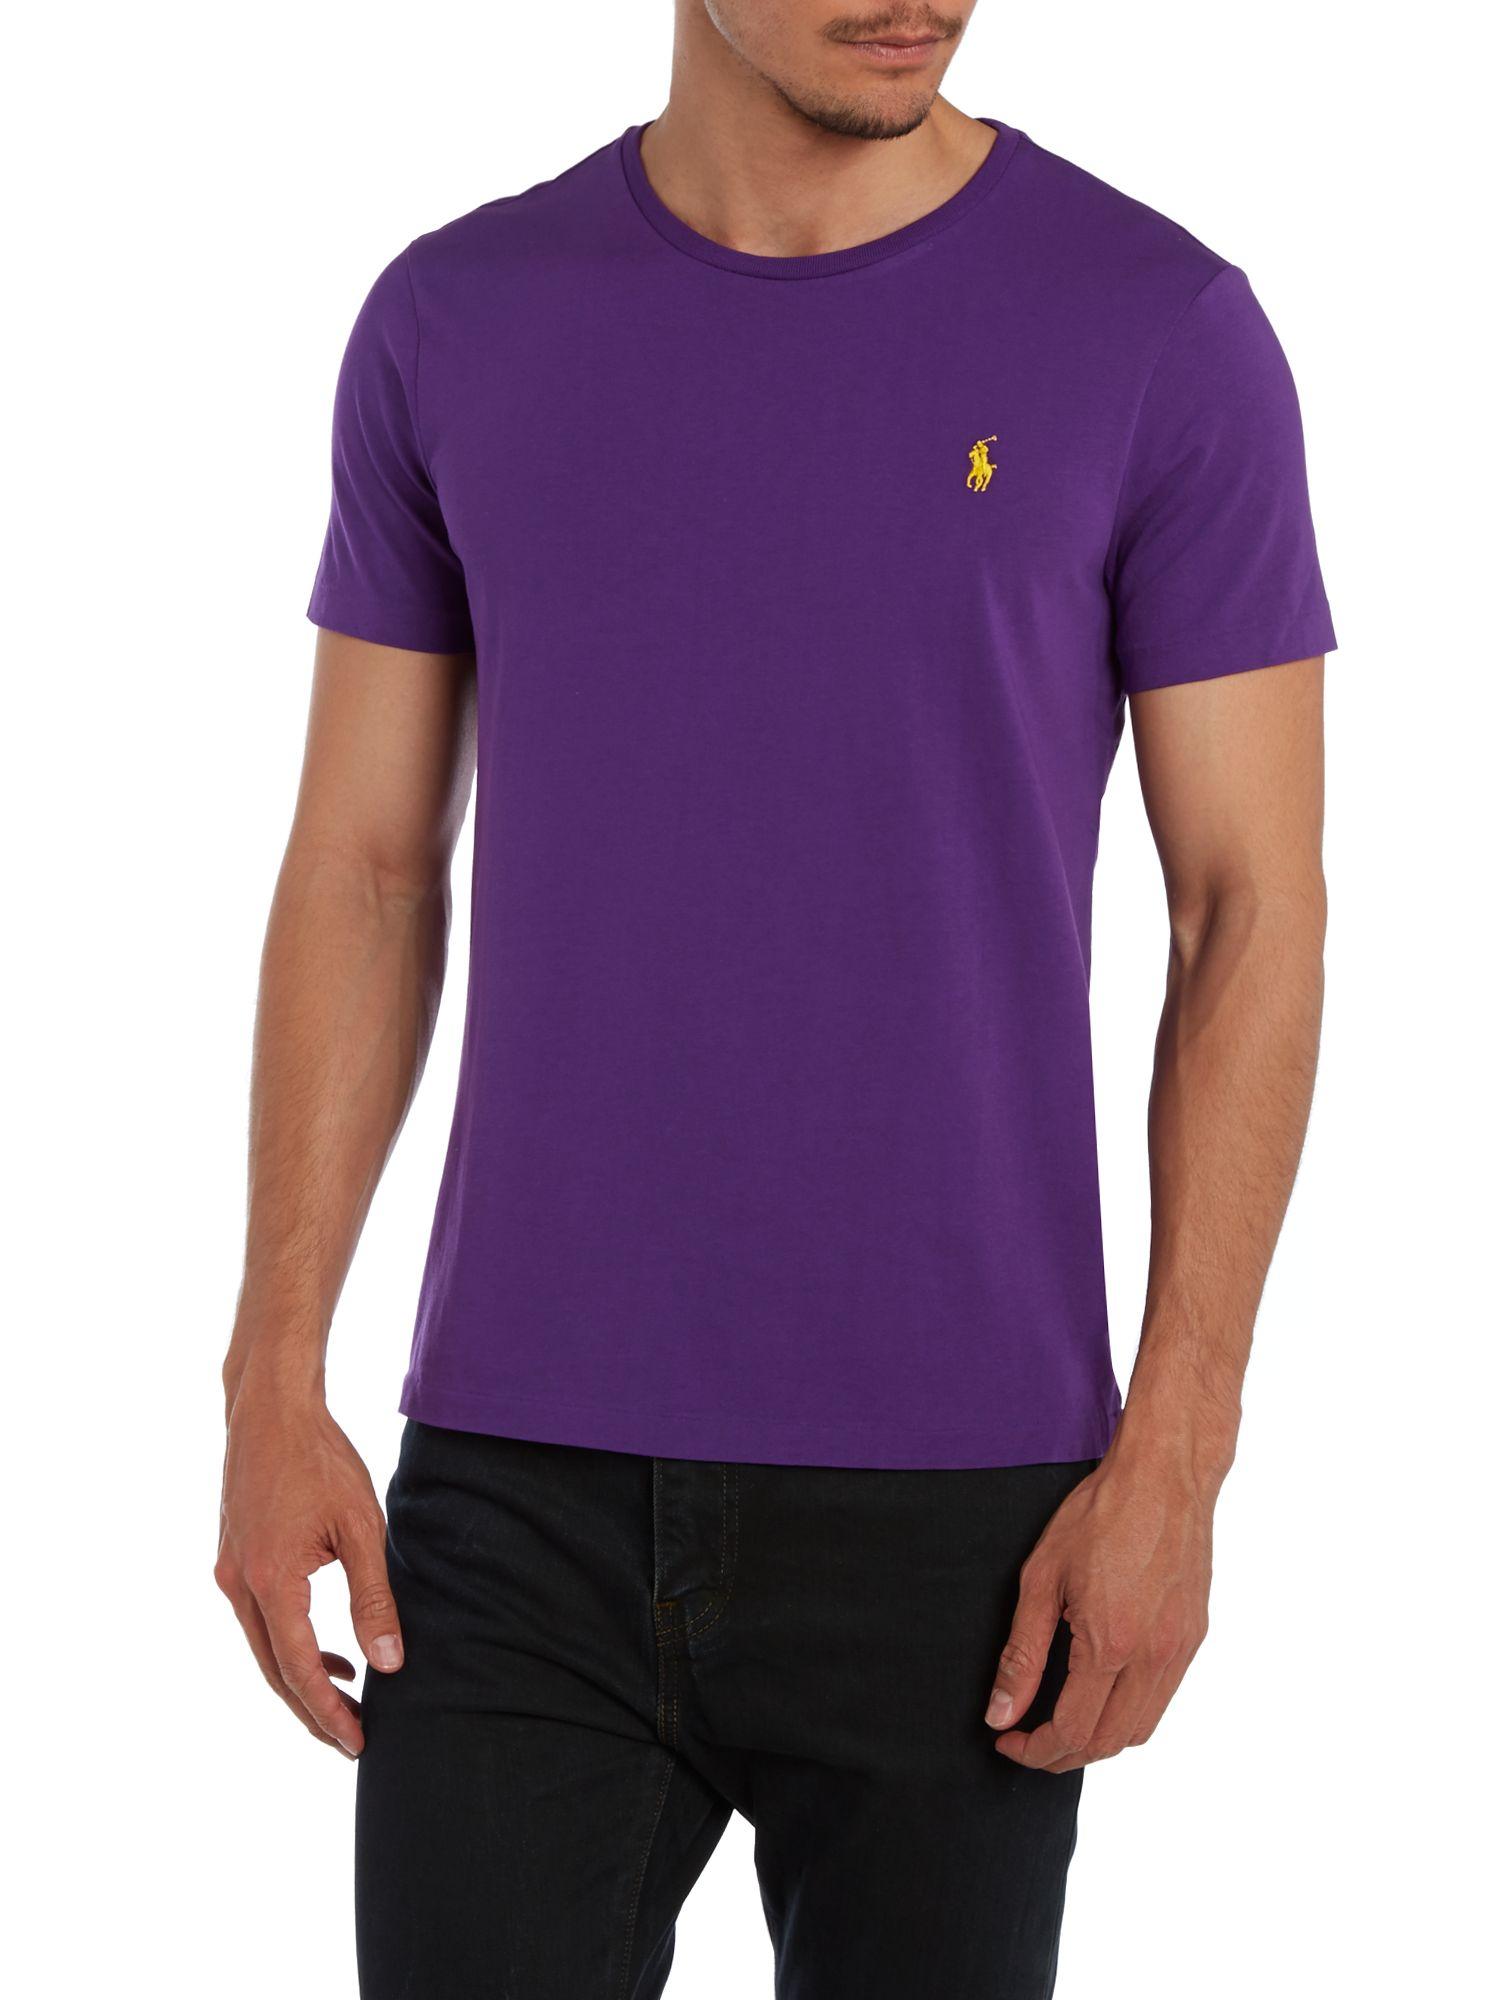 Polo Ralph Lauren. Purple Crew Neck Custom Fit .